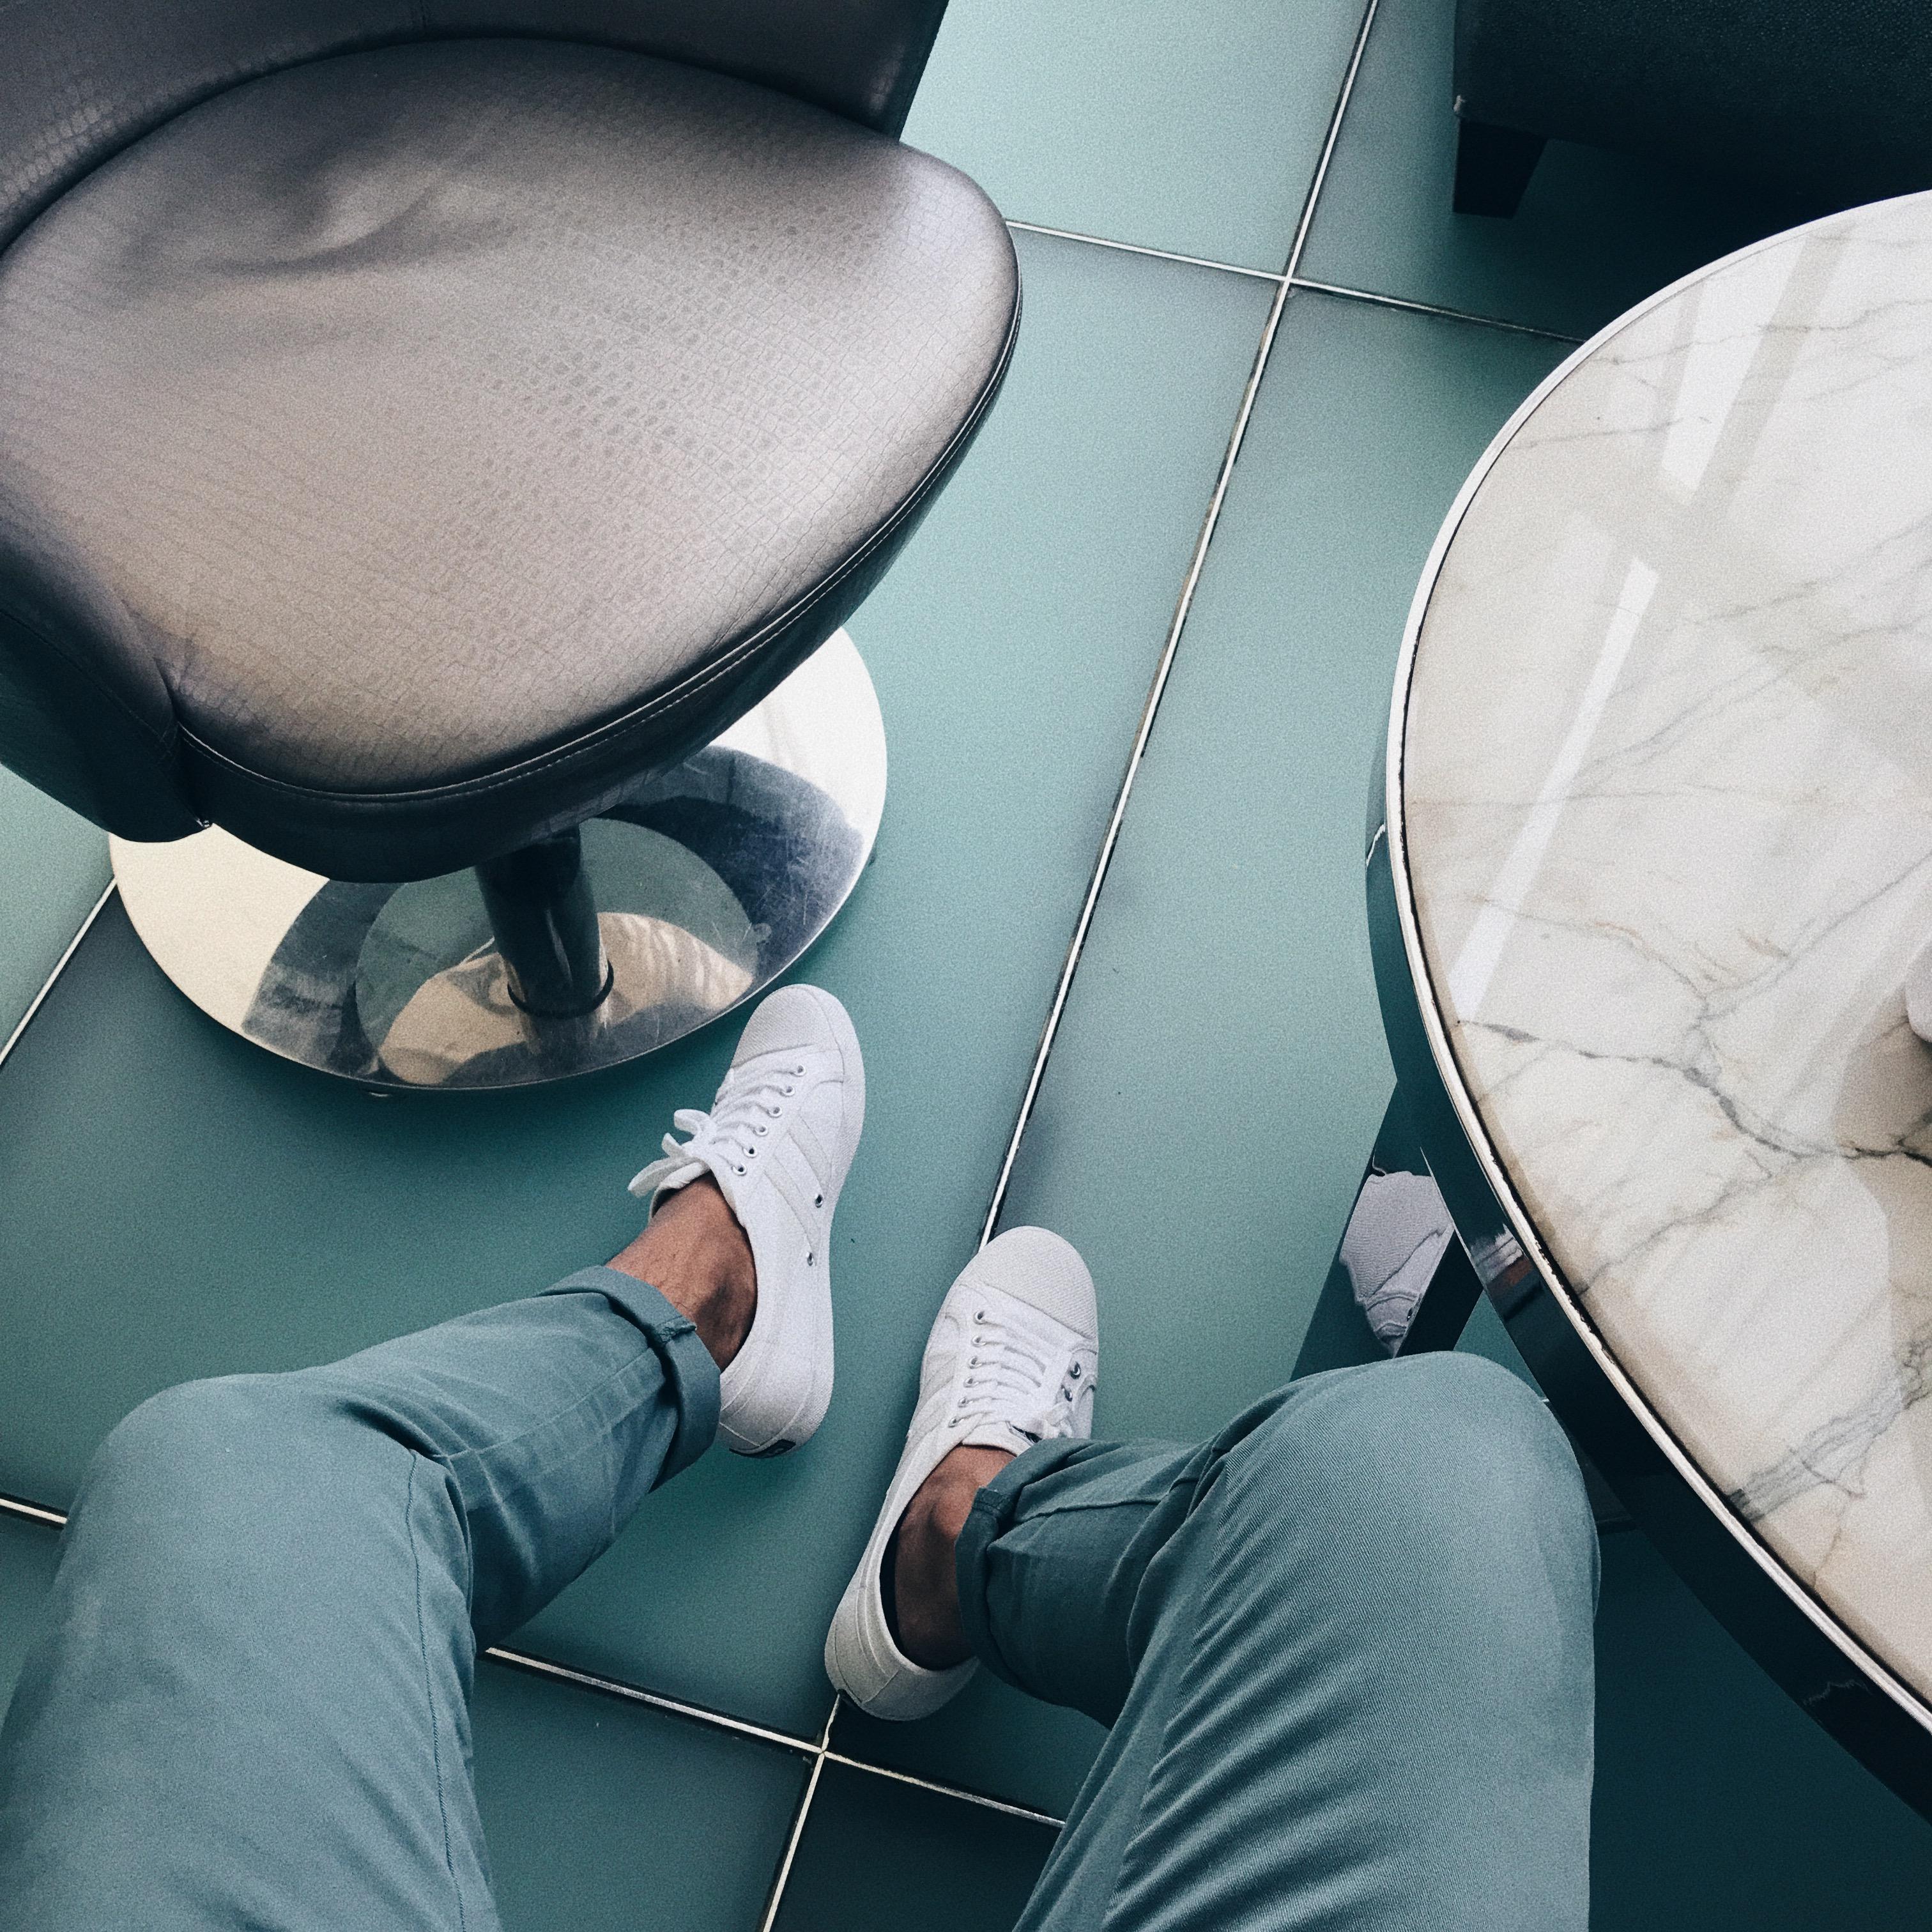 miami fontainebleau bleau bar interior photos instagram